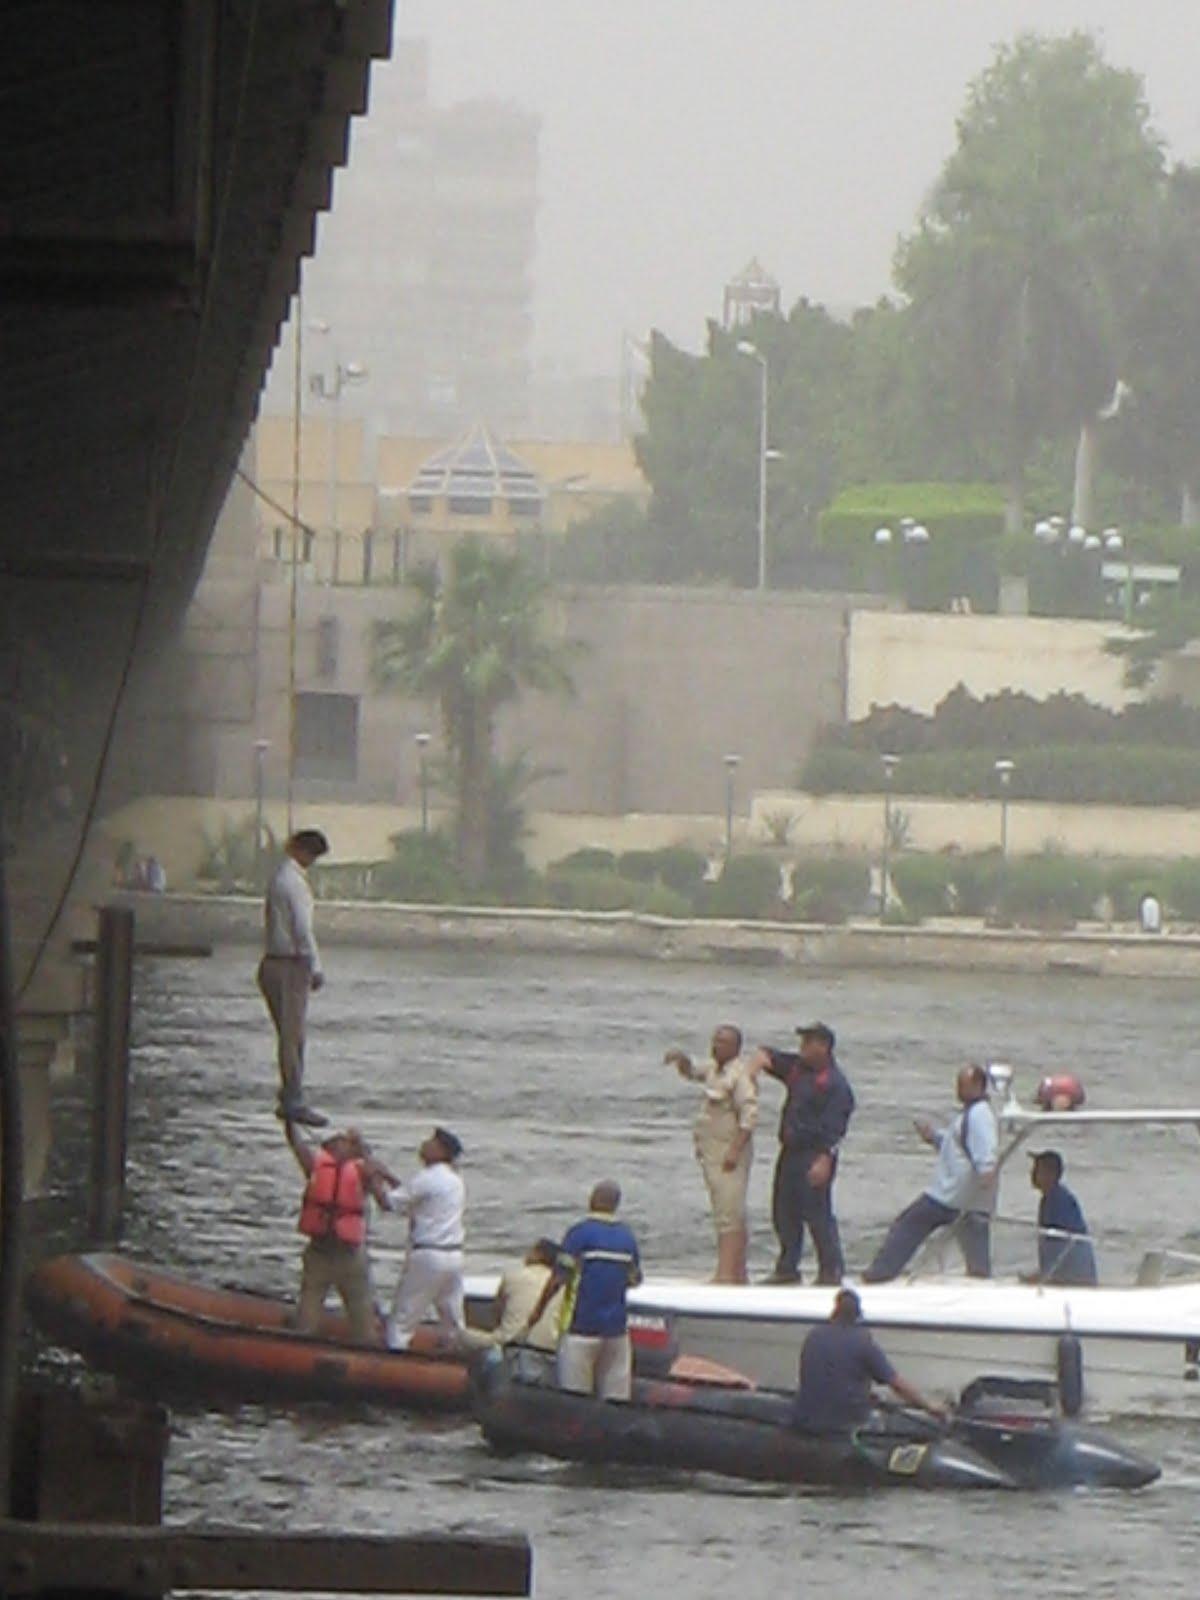 5ad6db05a عمرو انتحر على كوبرى قصر النيل من اجل حب منى